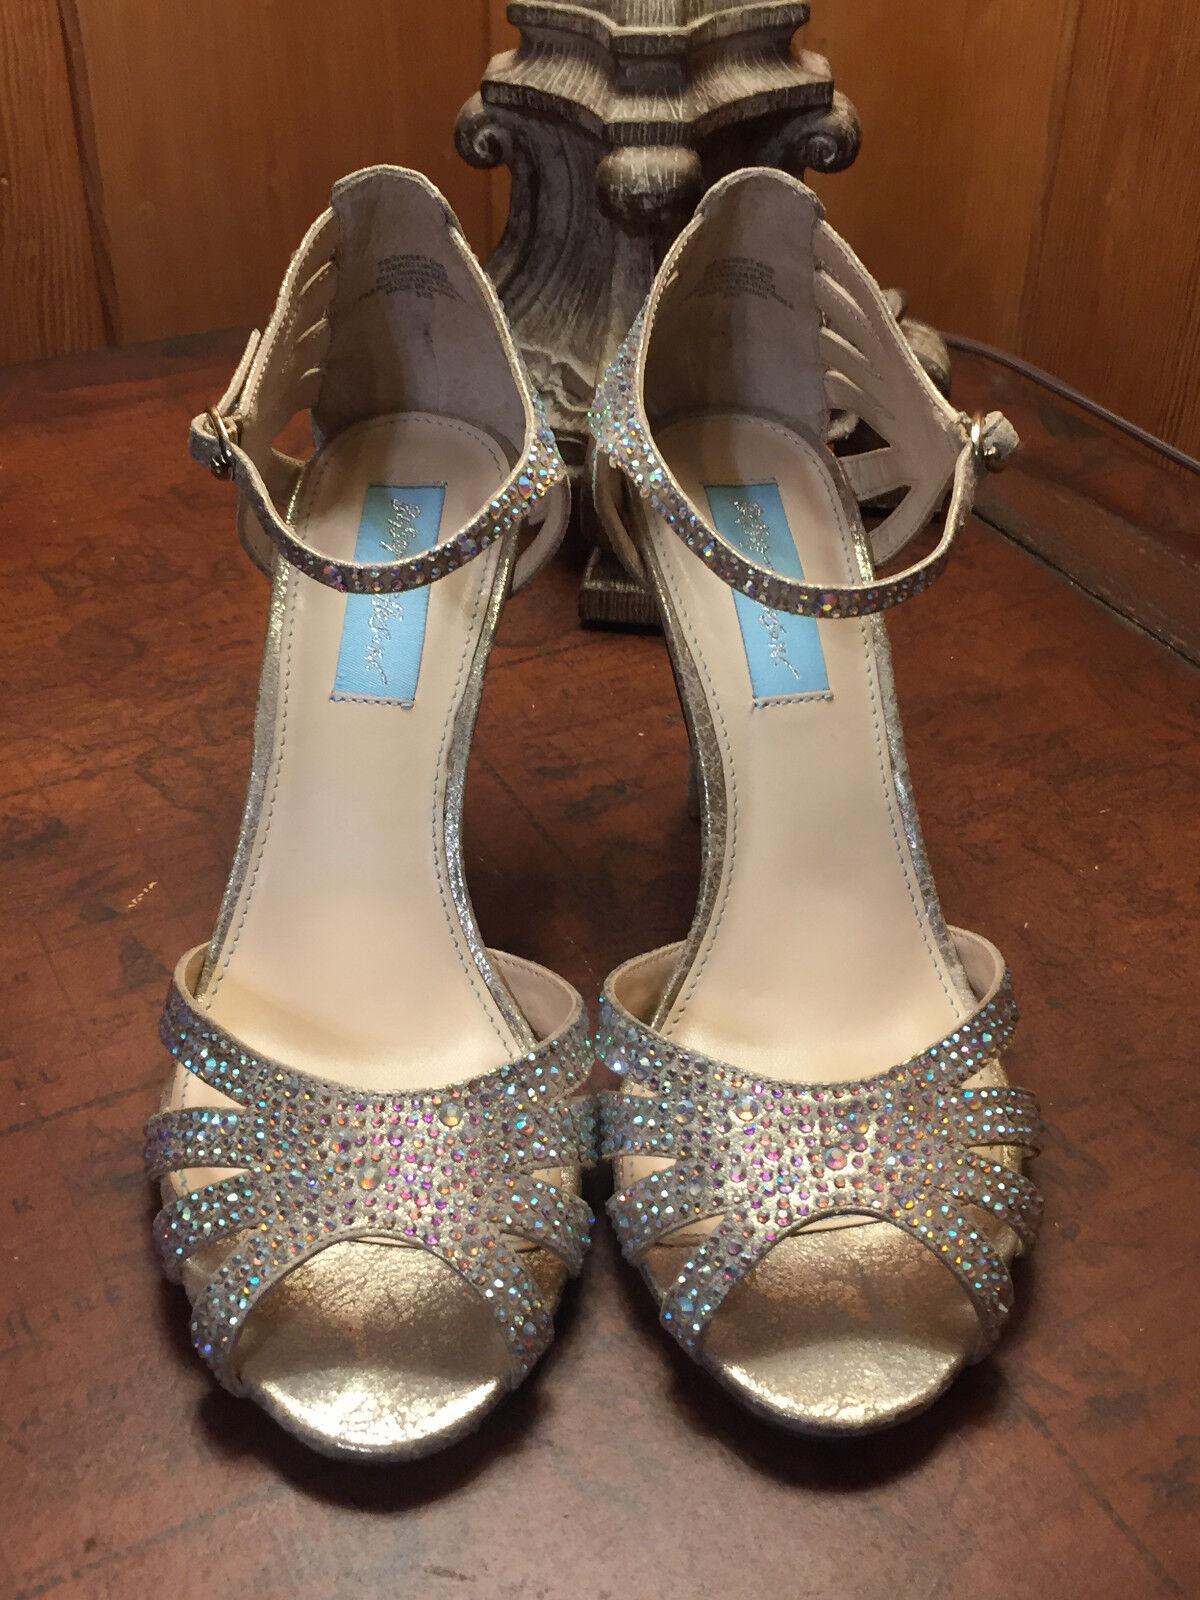 Blau by Betsey Johnson Johnson Johnson Sweet Rhinestone Embellished Evening Open Toe Sandals 6.5 fec8a0